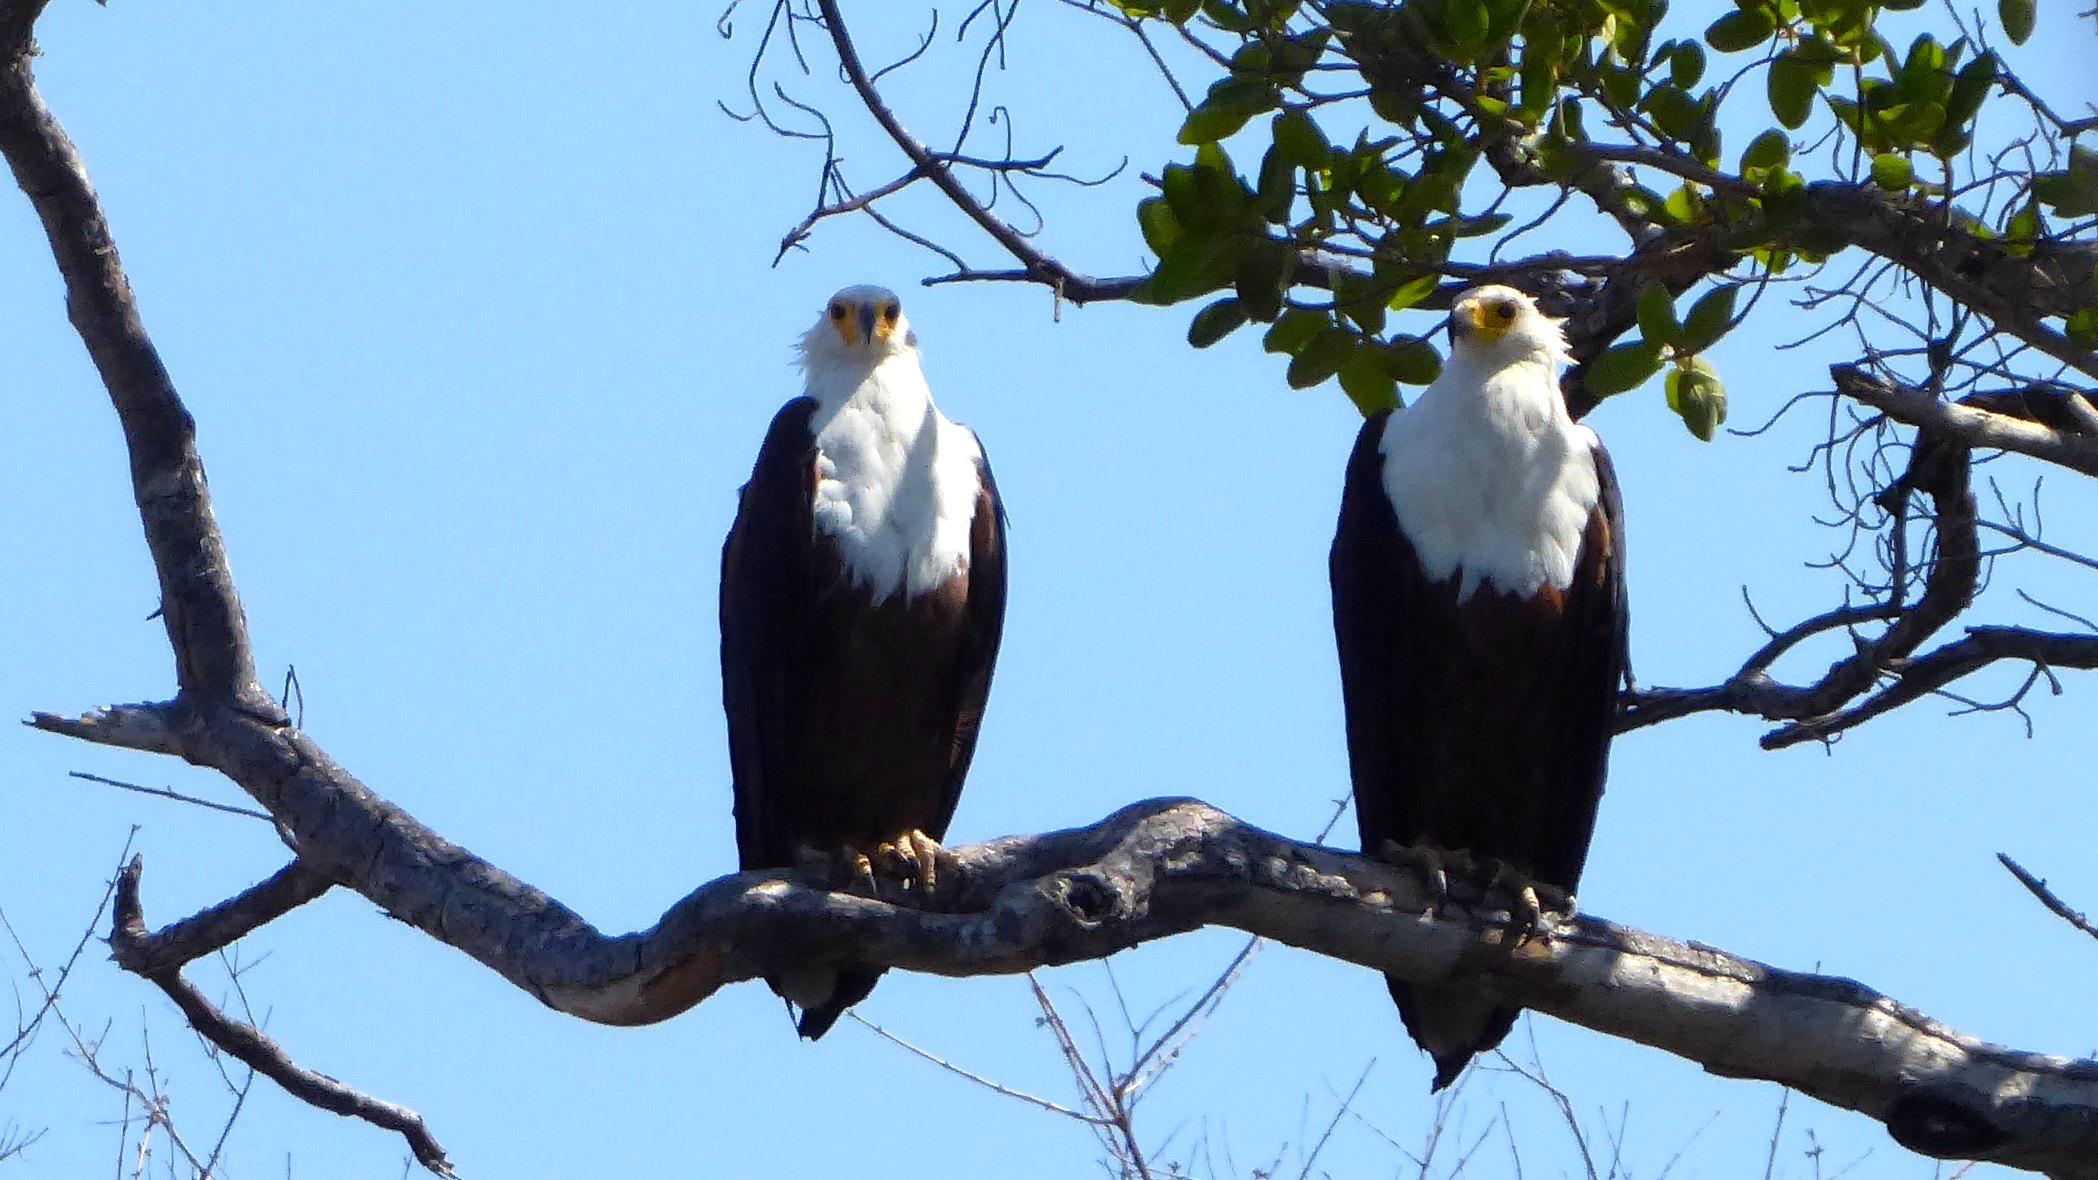 Lotri Bay, Lake Kariba, Zambia - Fish Eagles